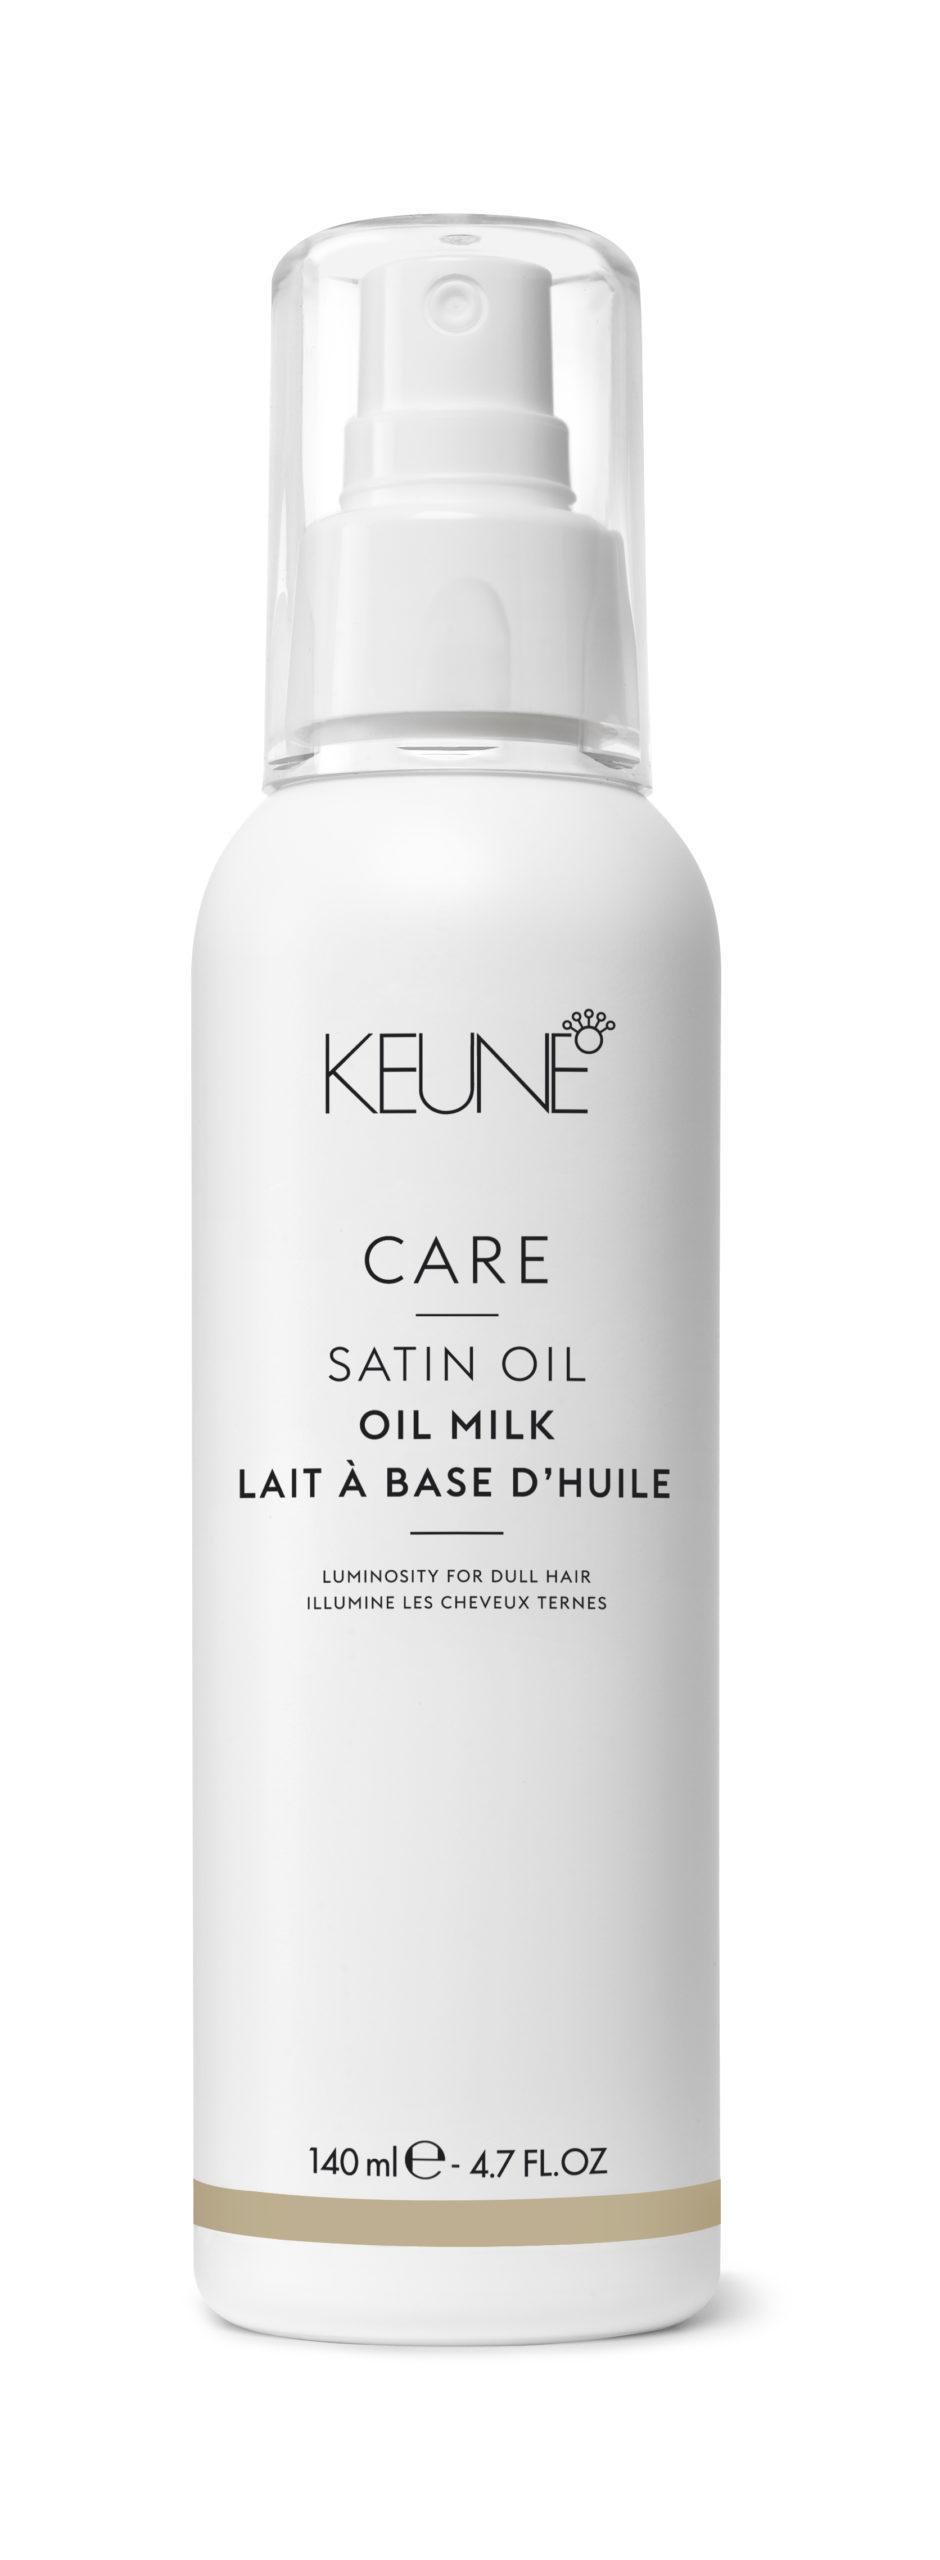 Care-Satin-Oil-Oil-Milk-highres